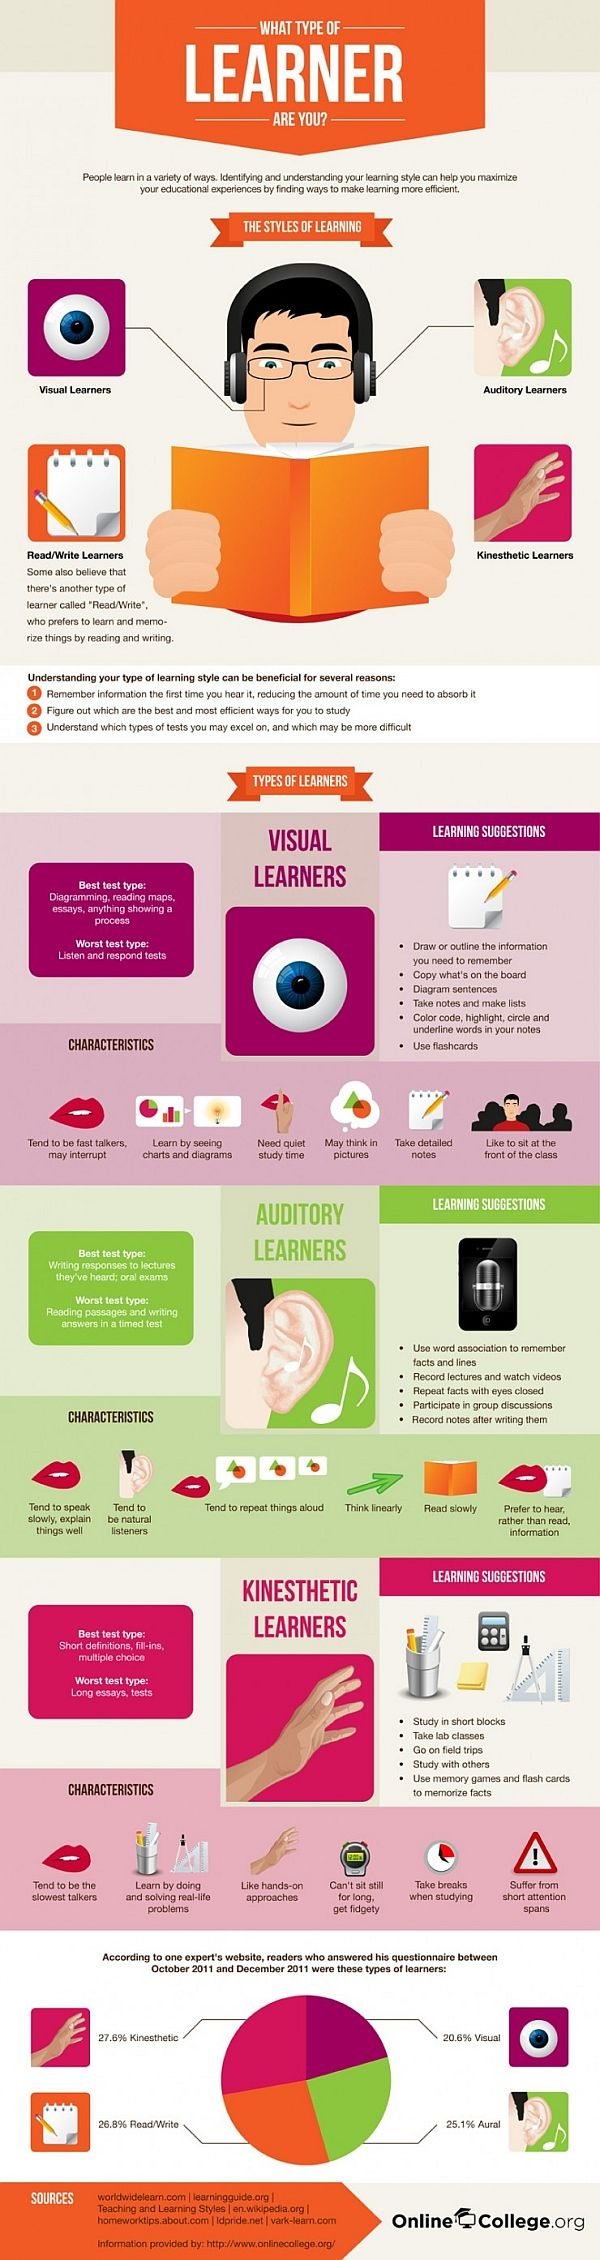 How Do You Learn? | CarlaJohnson•ca